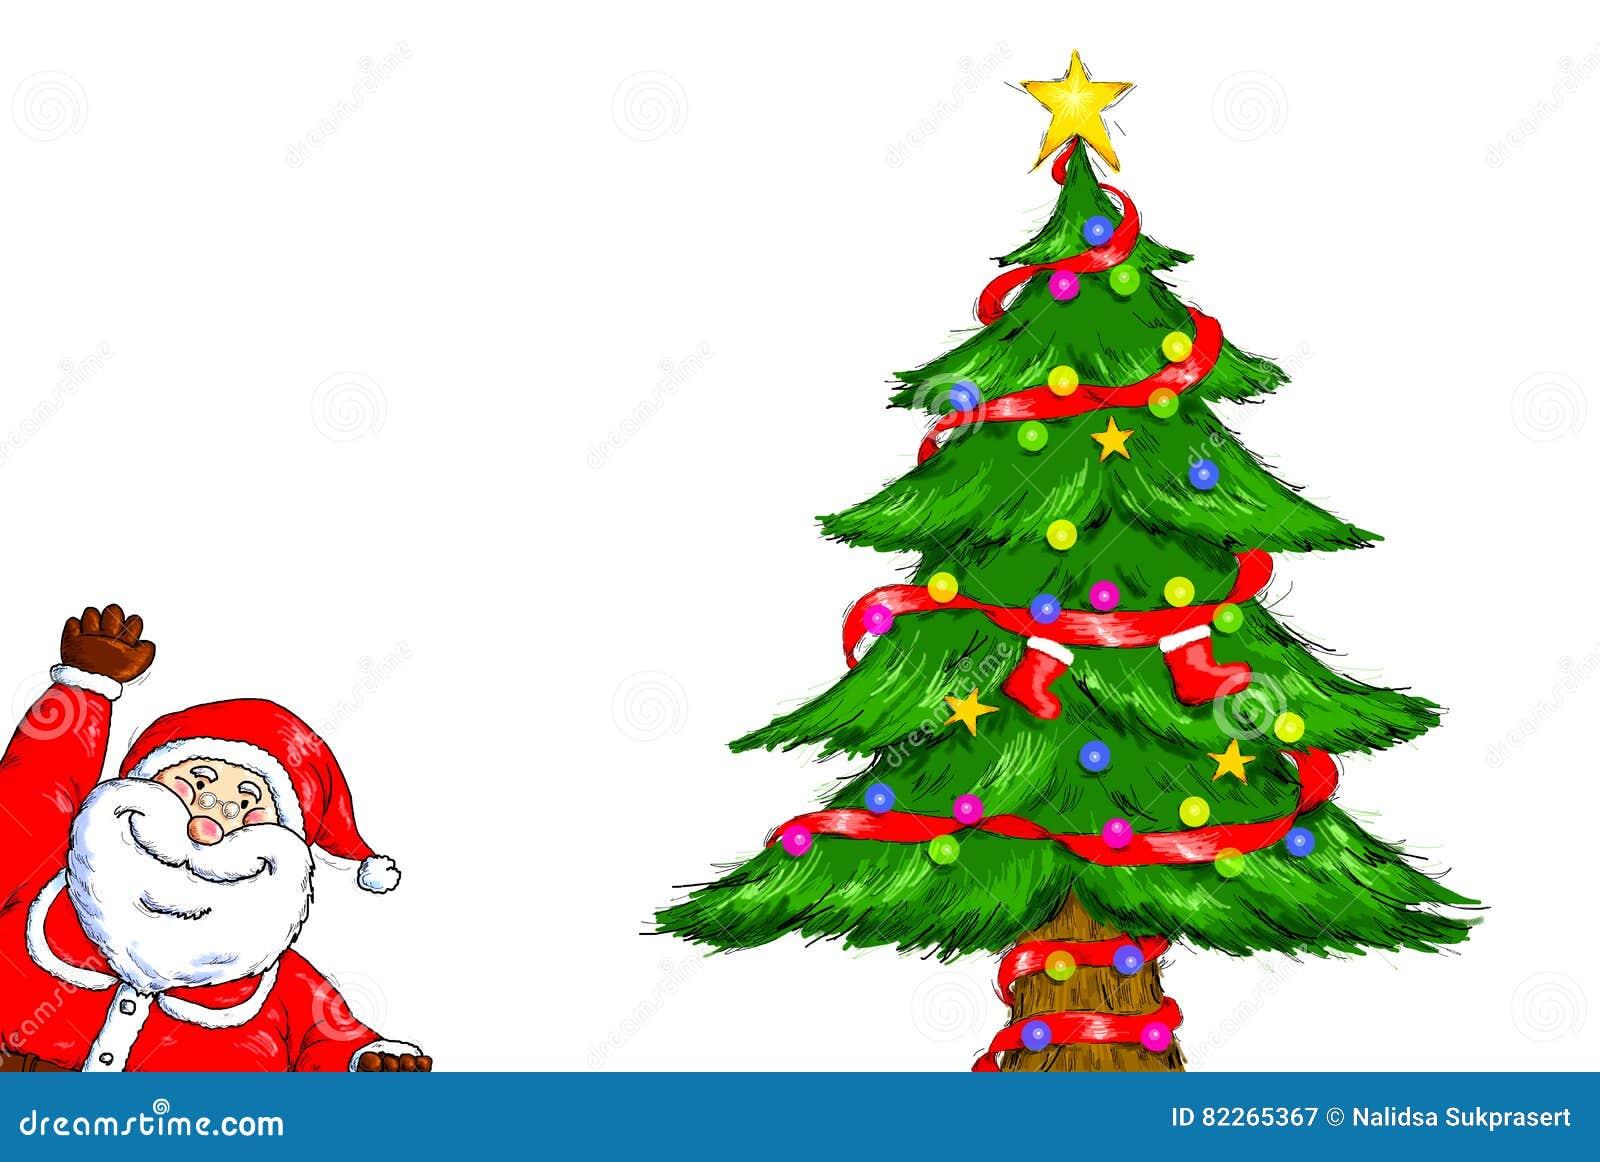 Merry Christmas Santa Claus Christmas Tree Celebration Stock